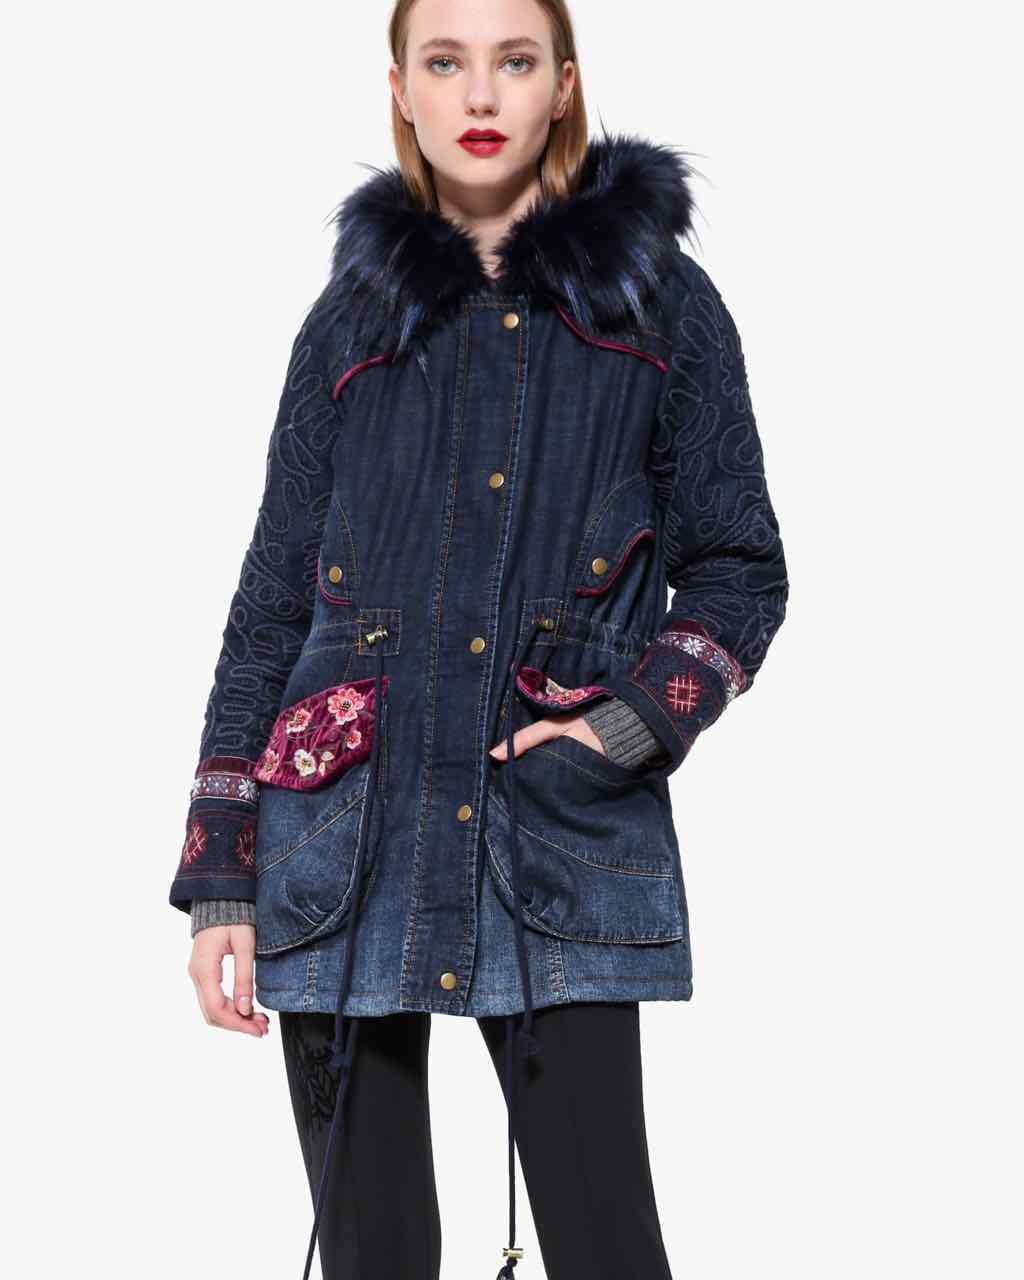 Desigual Denim Coat Natasha, Fall Winter 2017 2018